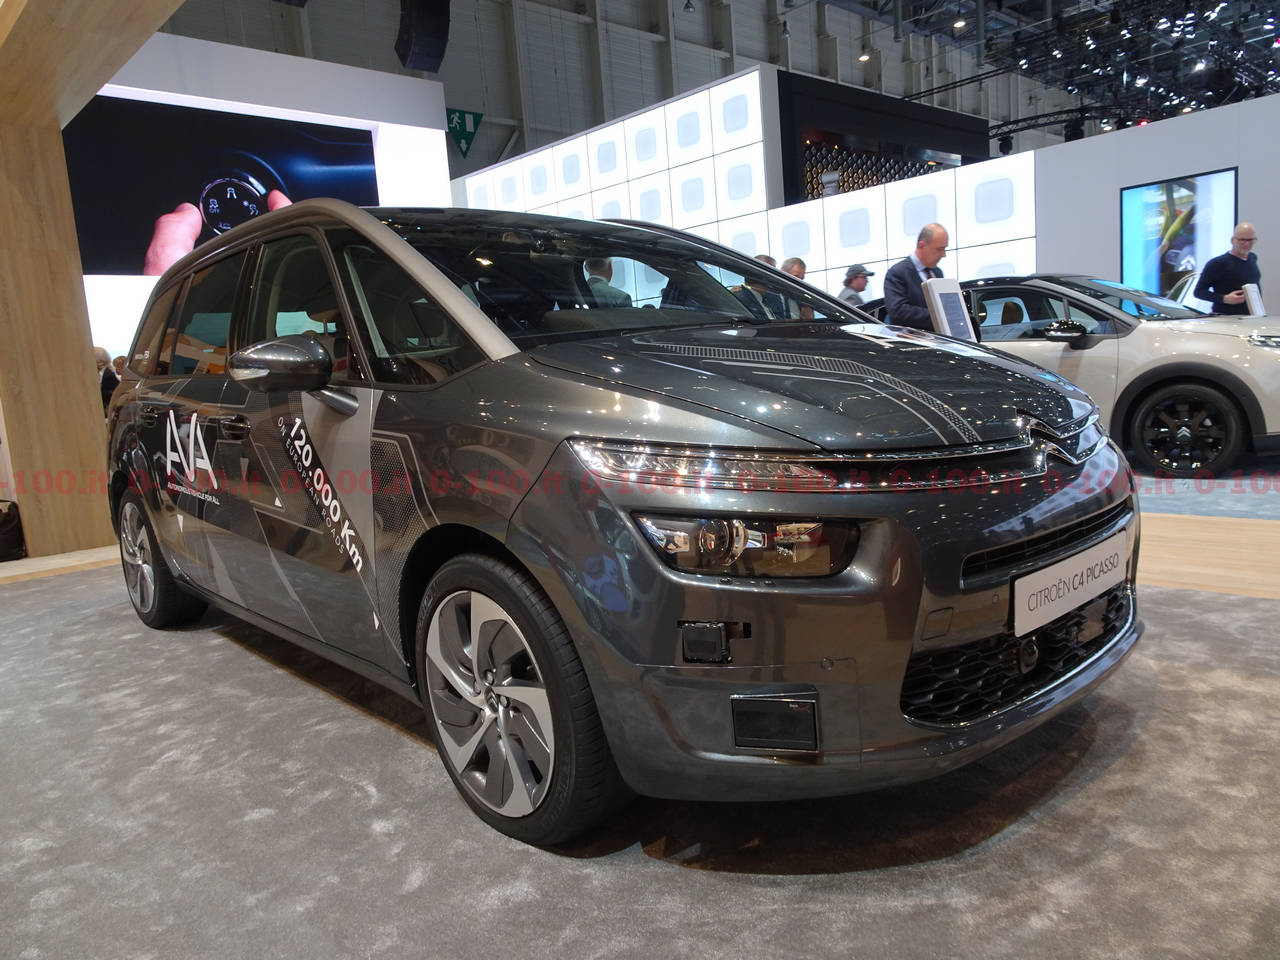 Ginevra-geneva-geneve-2017-Citroën-SpaceTourer-c4-grand-picasso-guida-autonoma-0-100_1